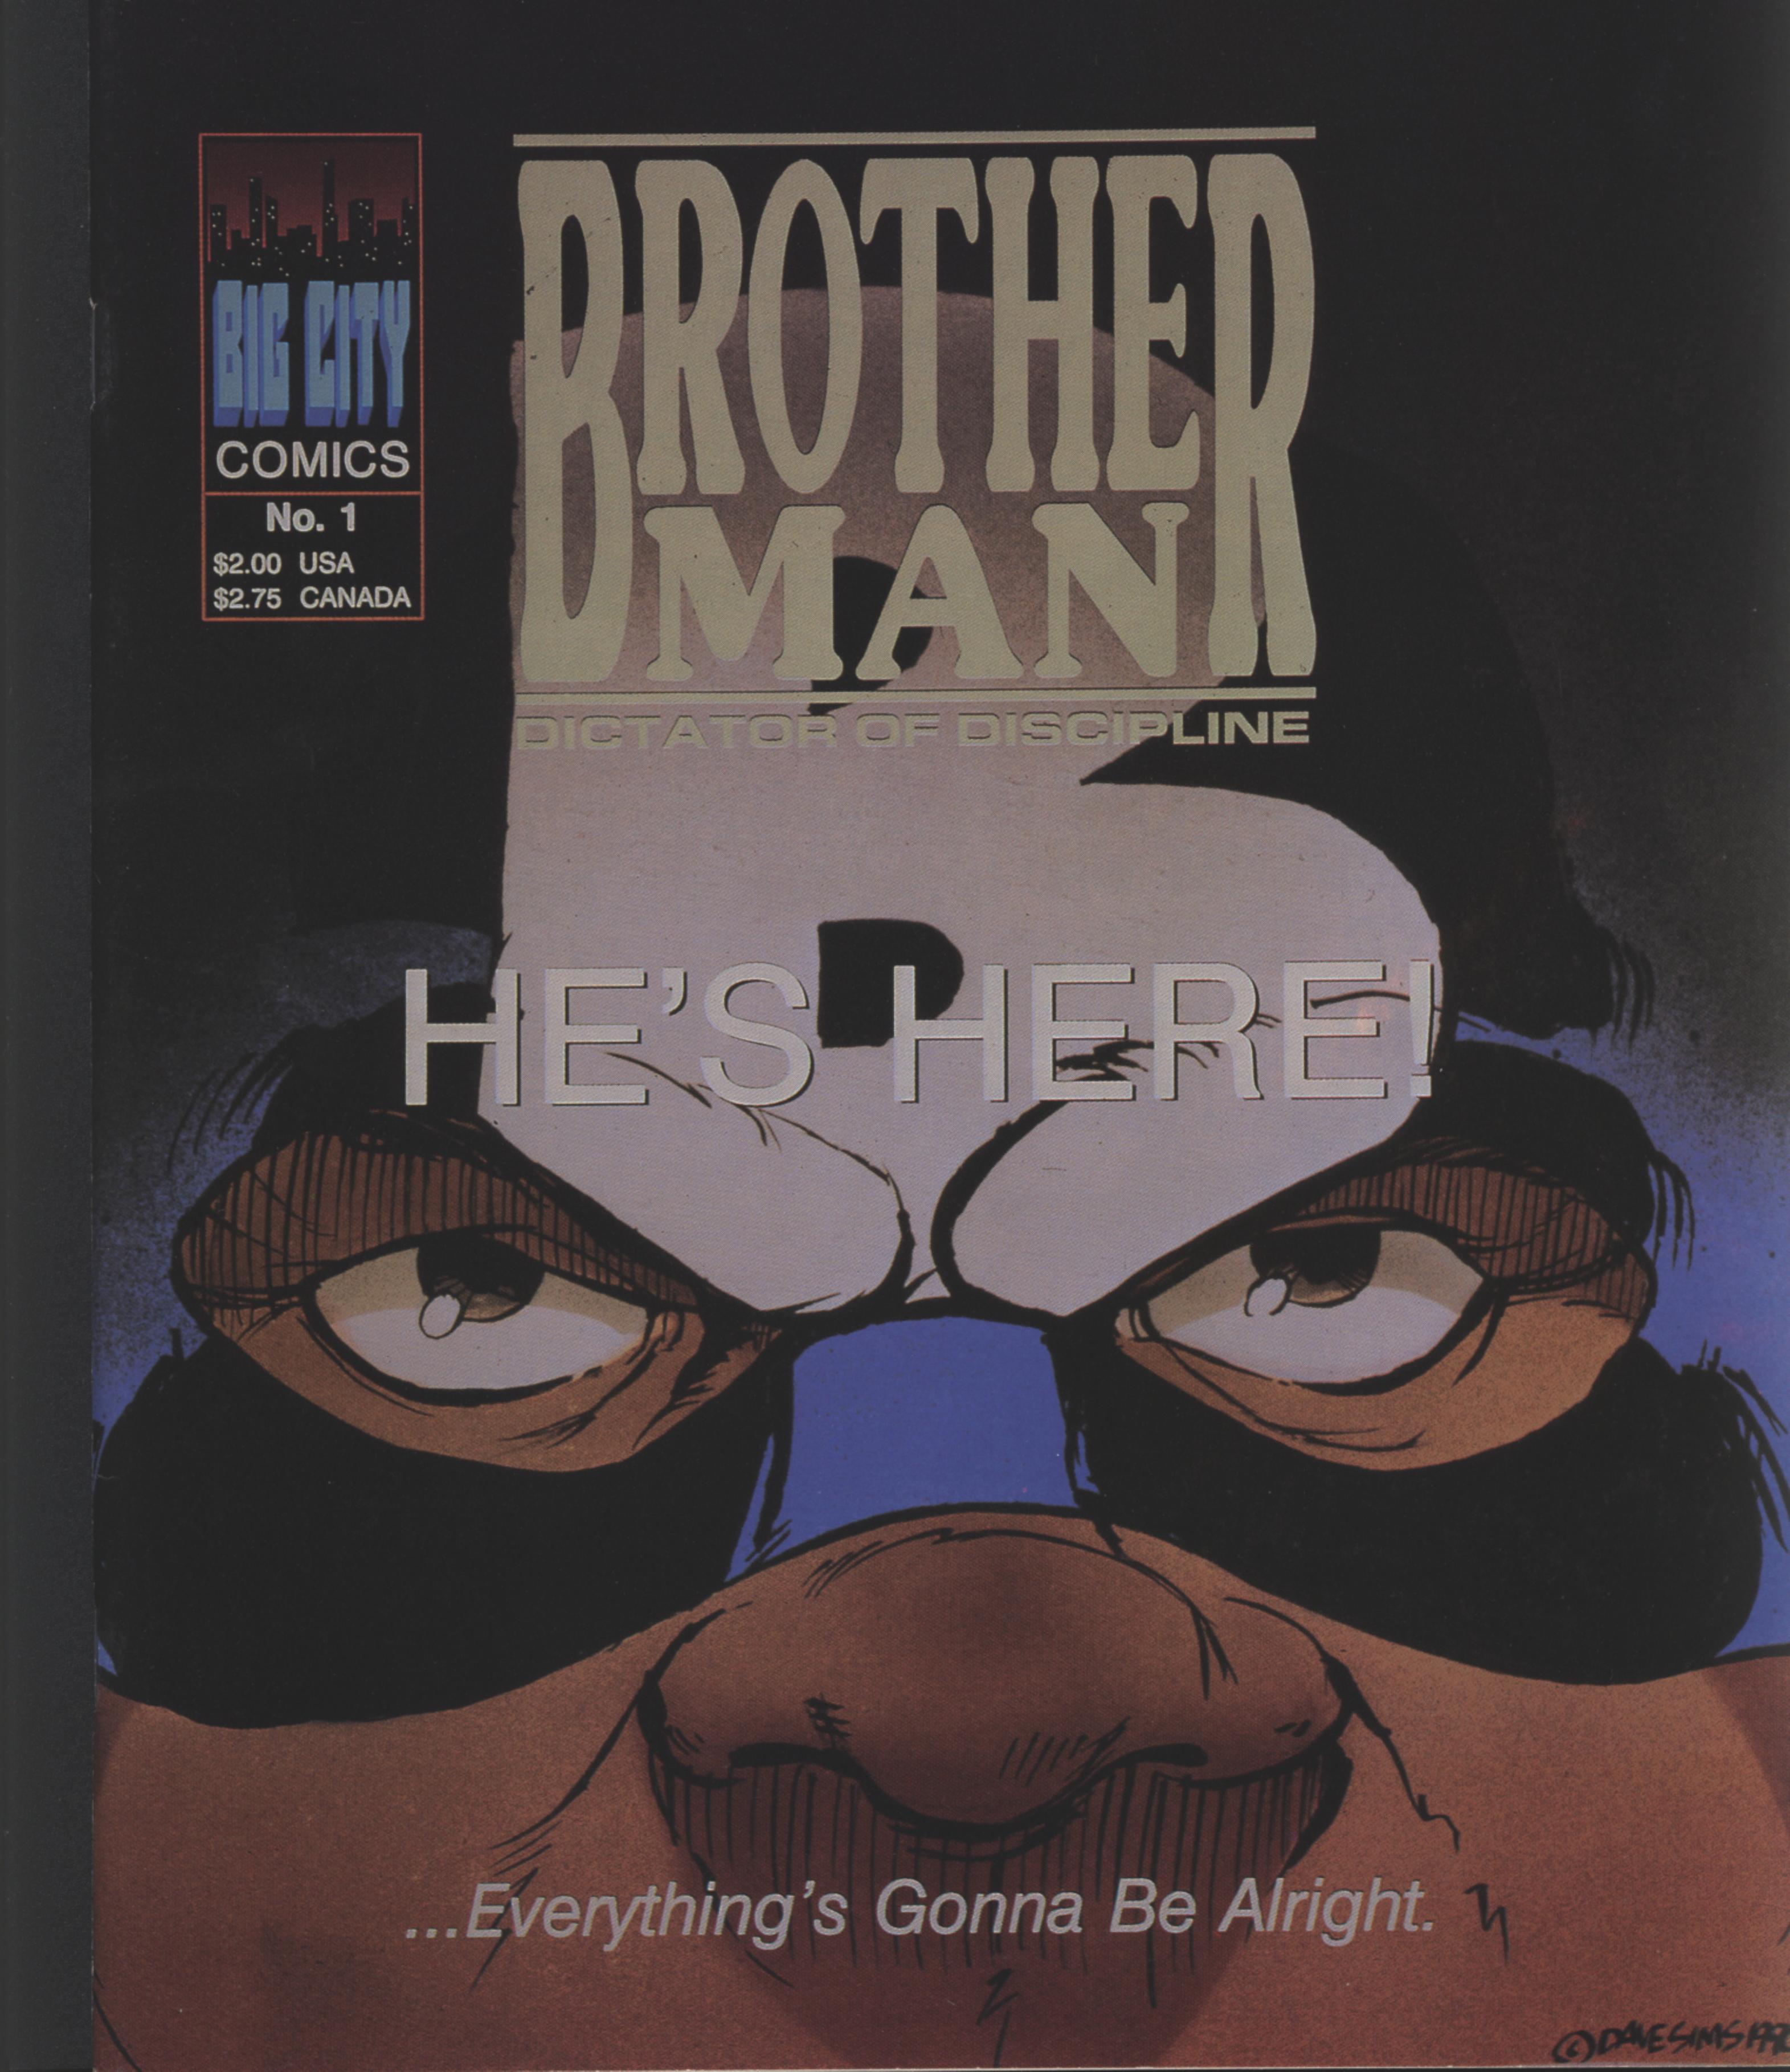 Gayles Black Superhero Documentary